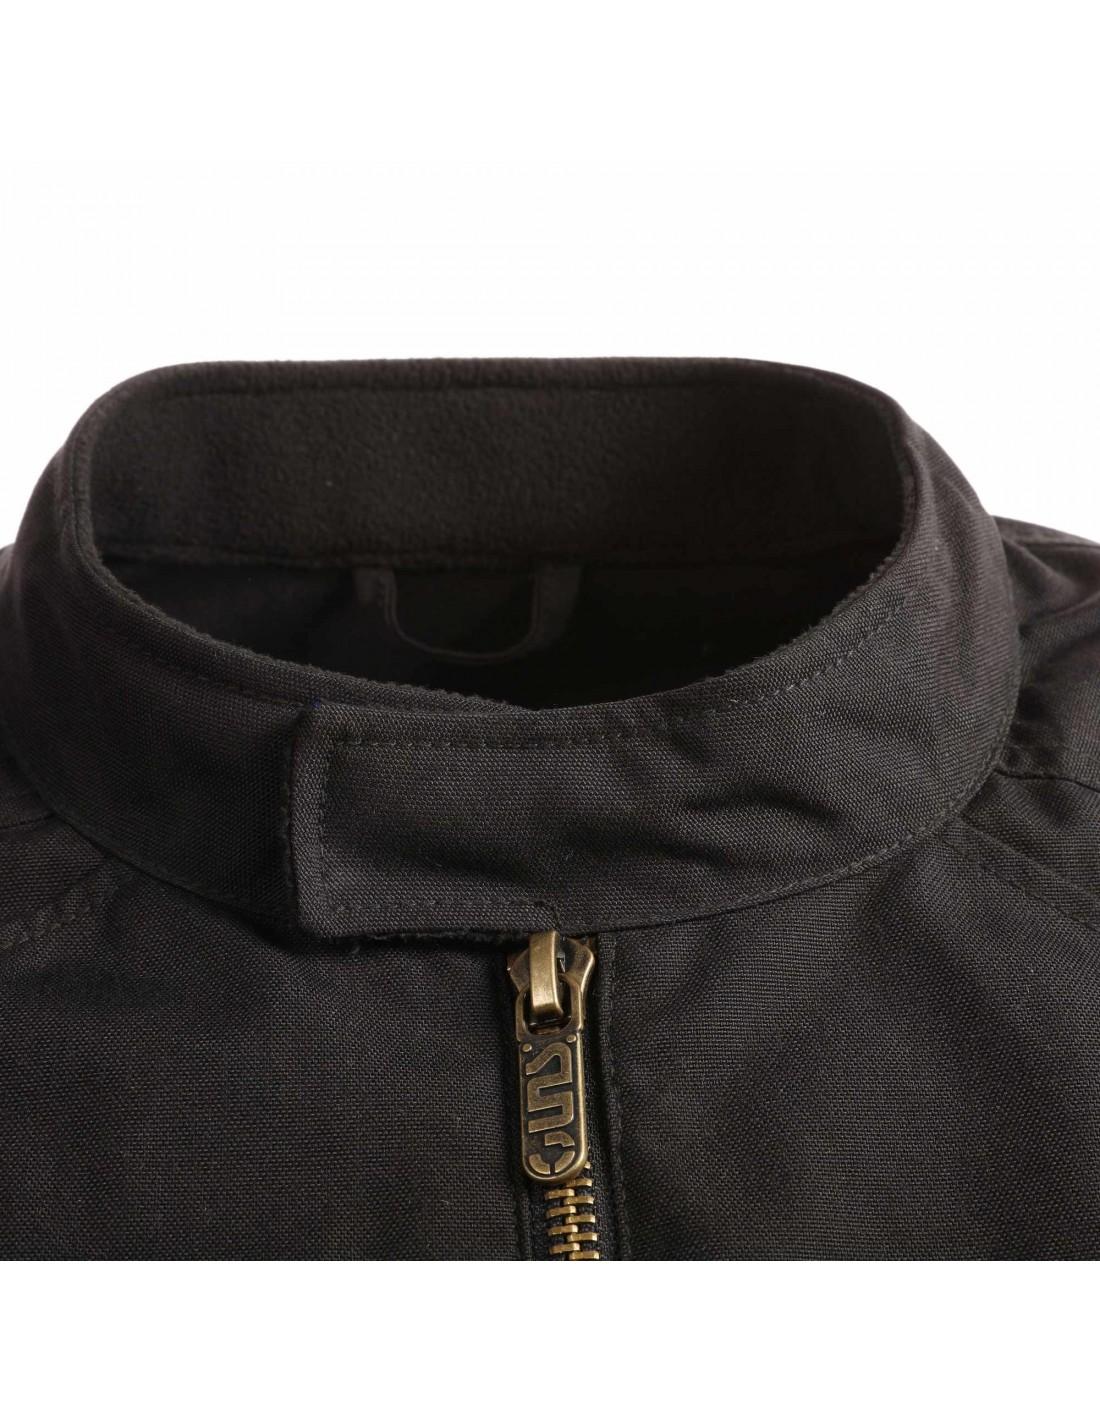 blouson moto textile guns mesh gunswear. Black Bedroom Furniture Sets. Home Design Ideas